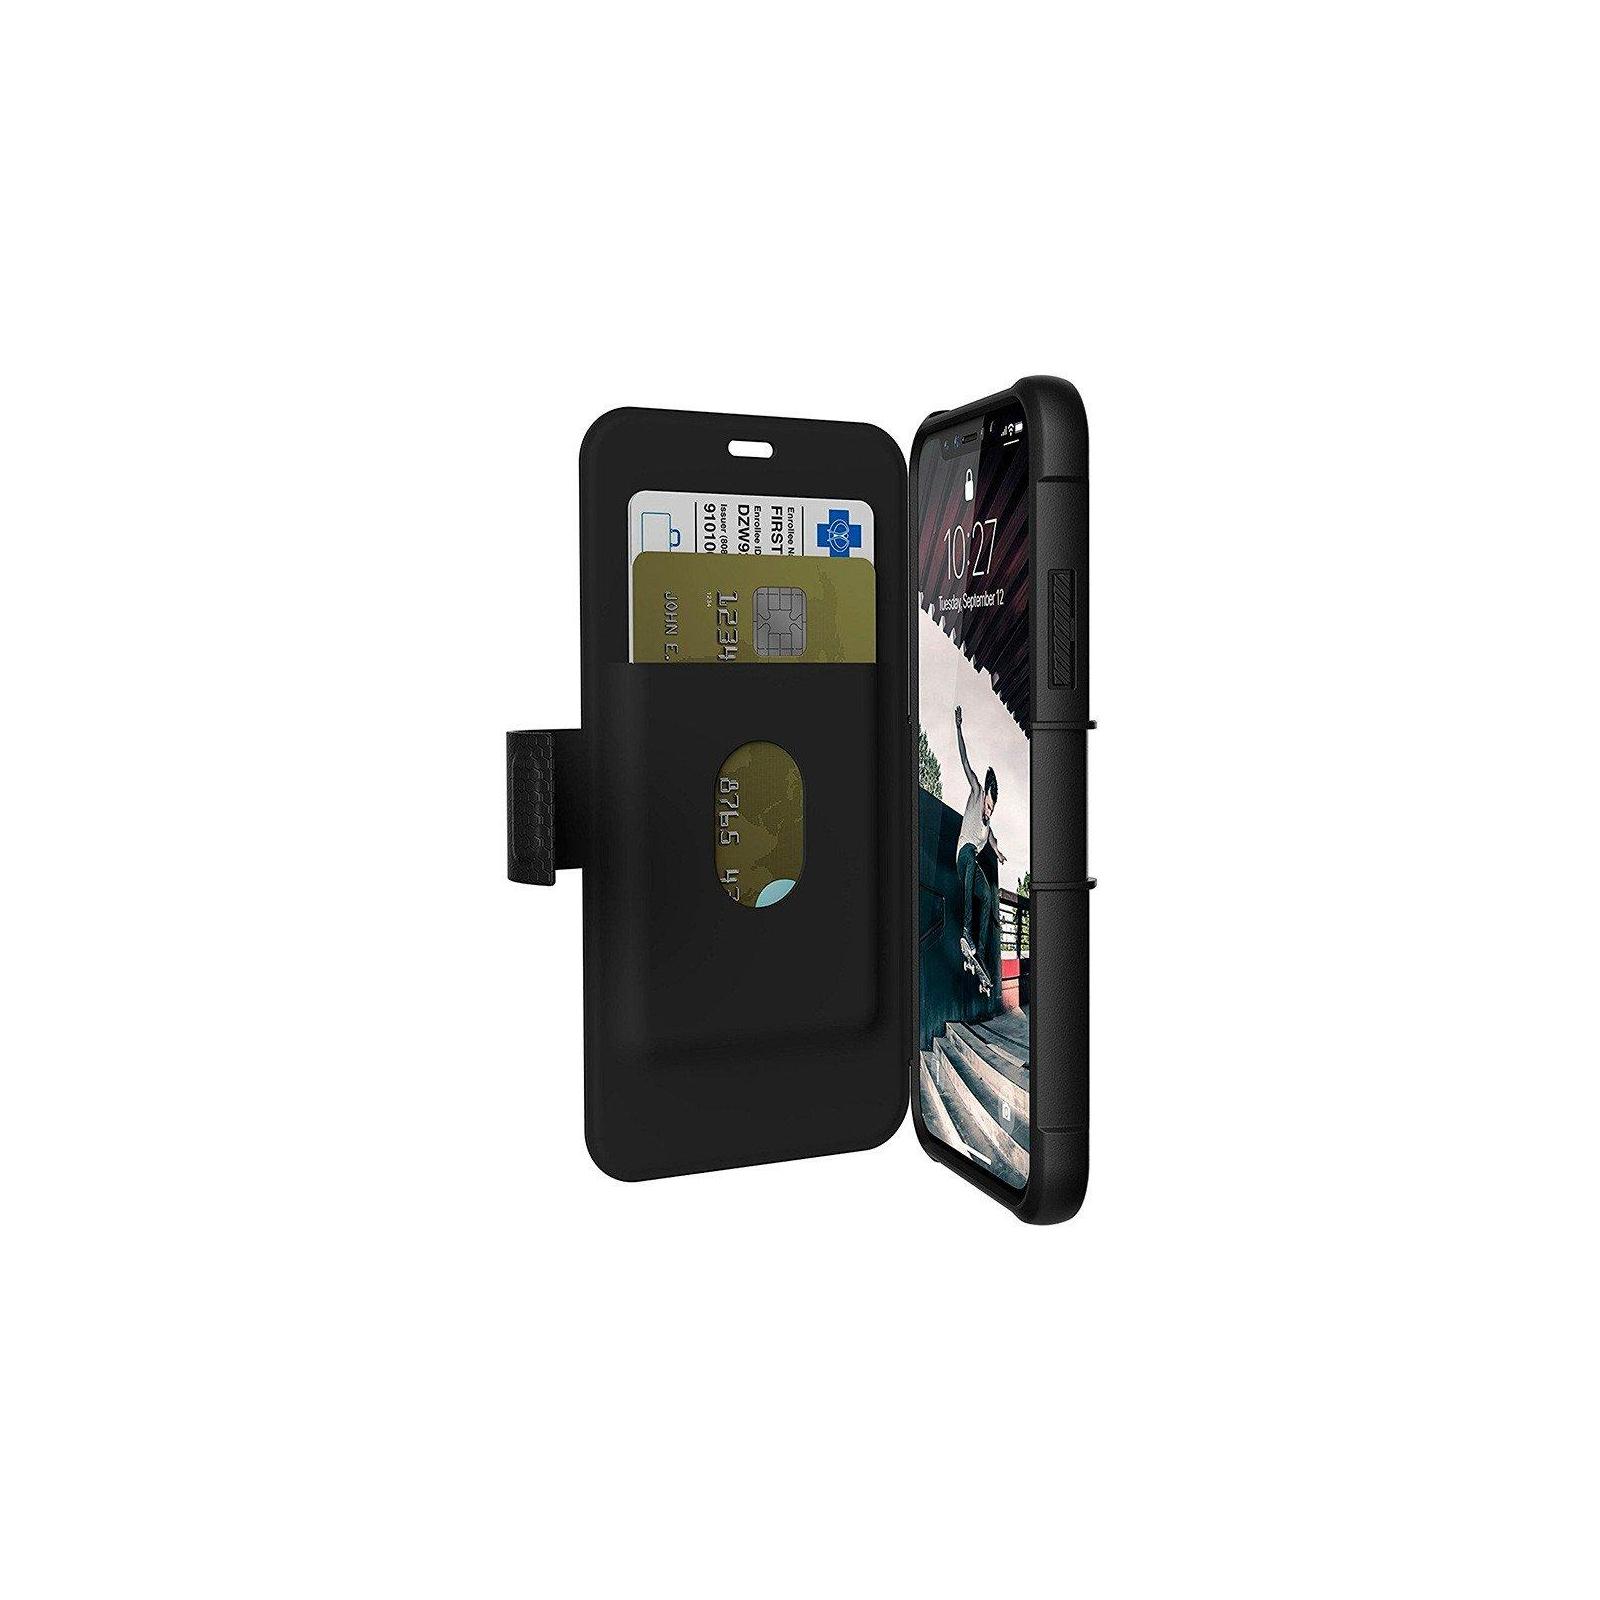 Чехол для моб. телефона Urban Armor Gear iPhone X Metropolis Black (IPHX-E-BL) изображение 5